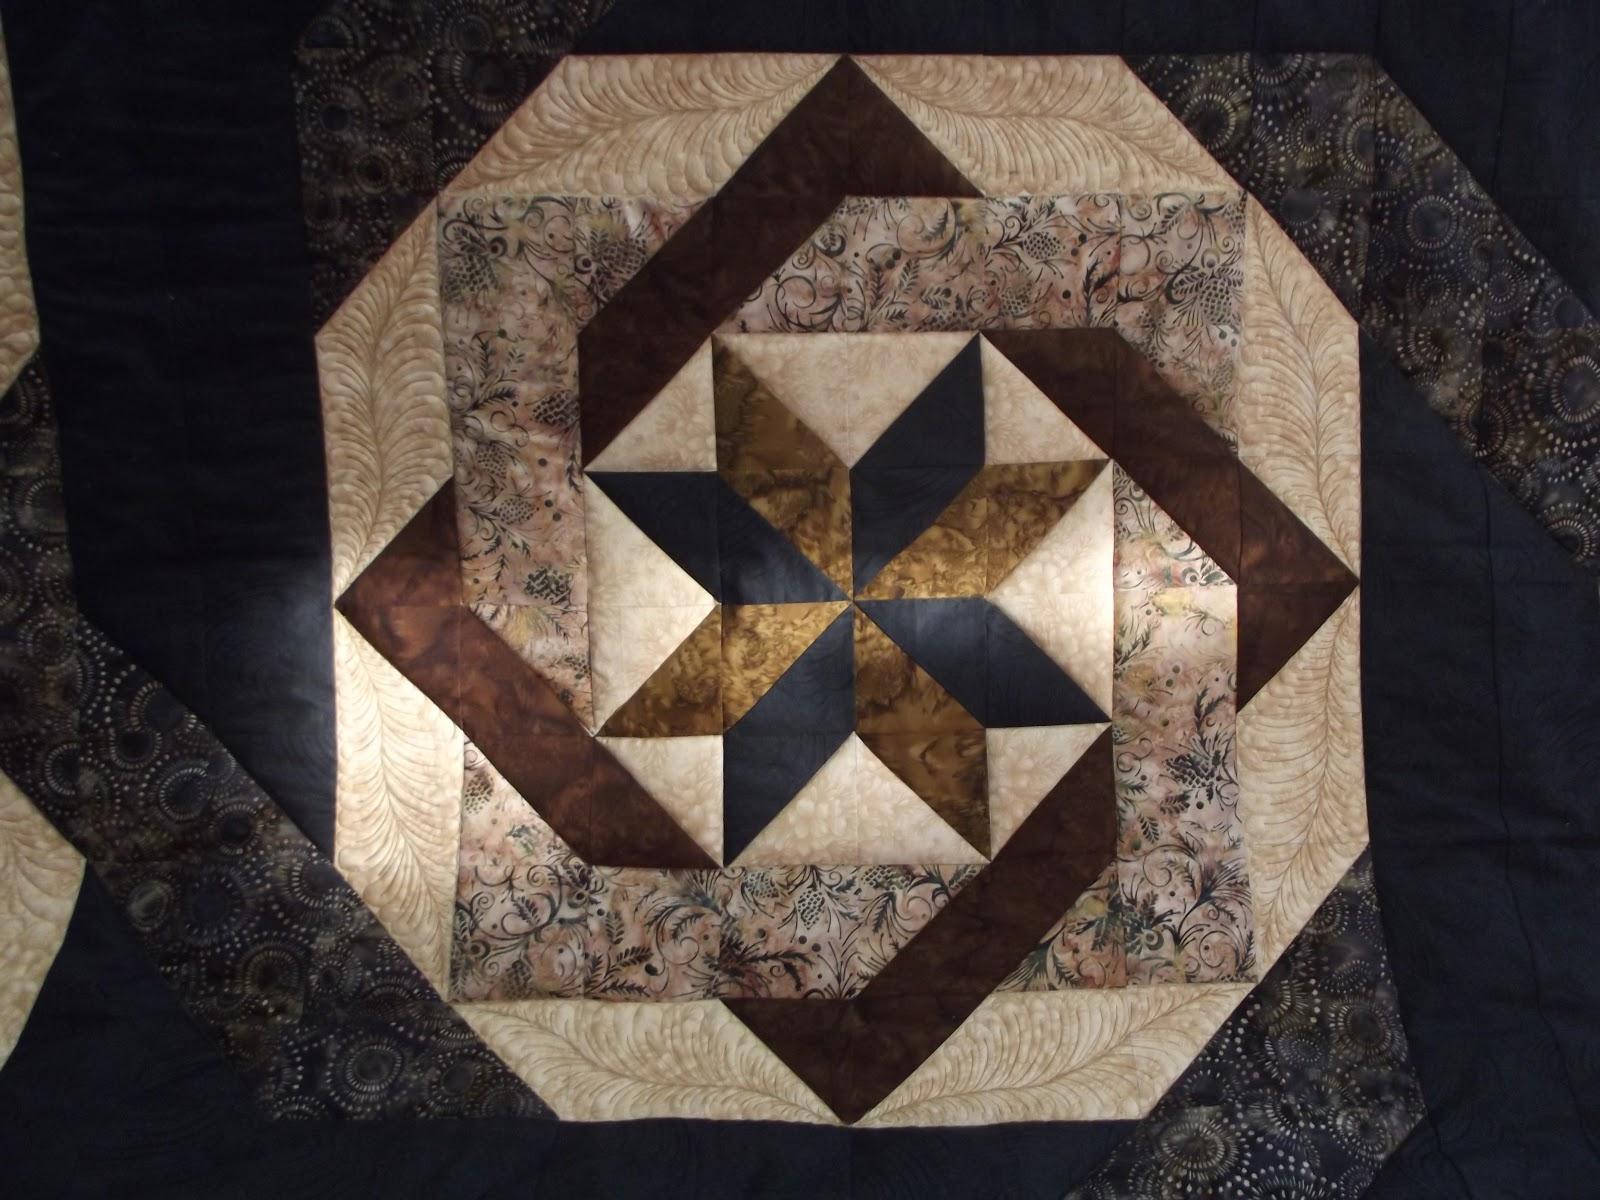 Labyrinth Quilt Block Patterns Patterns Kid